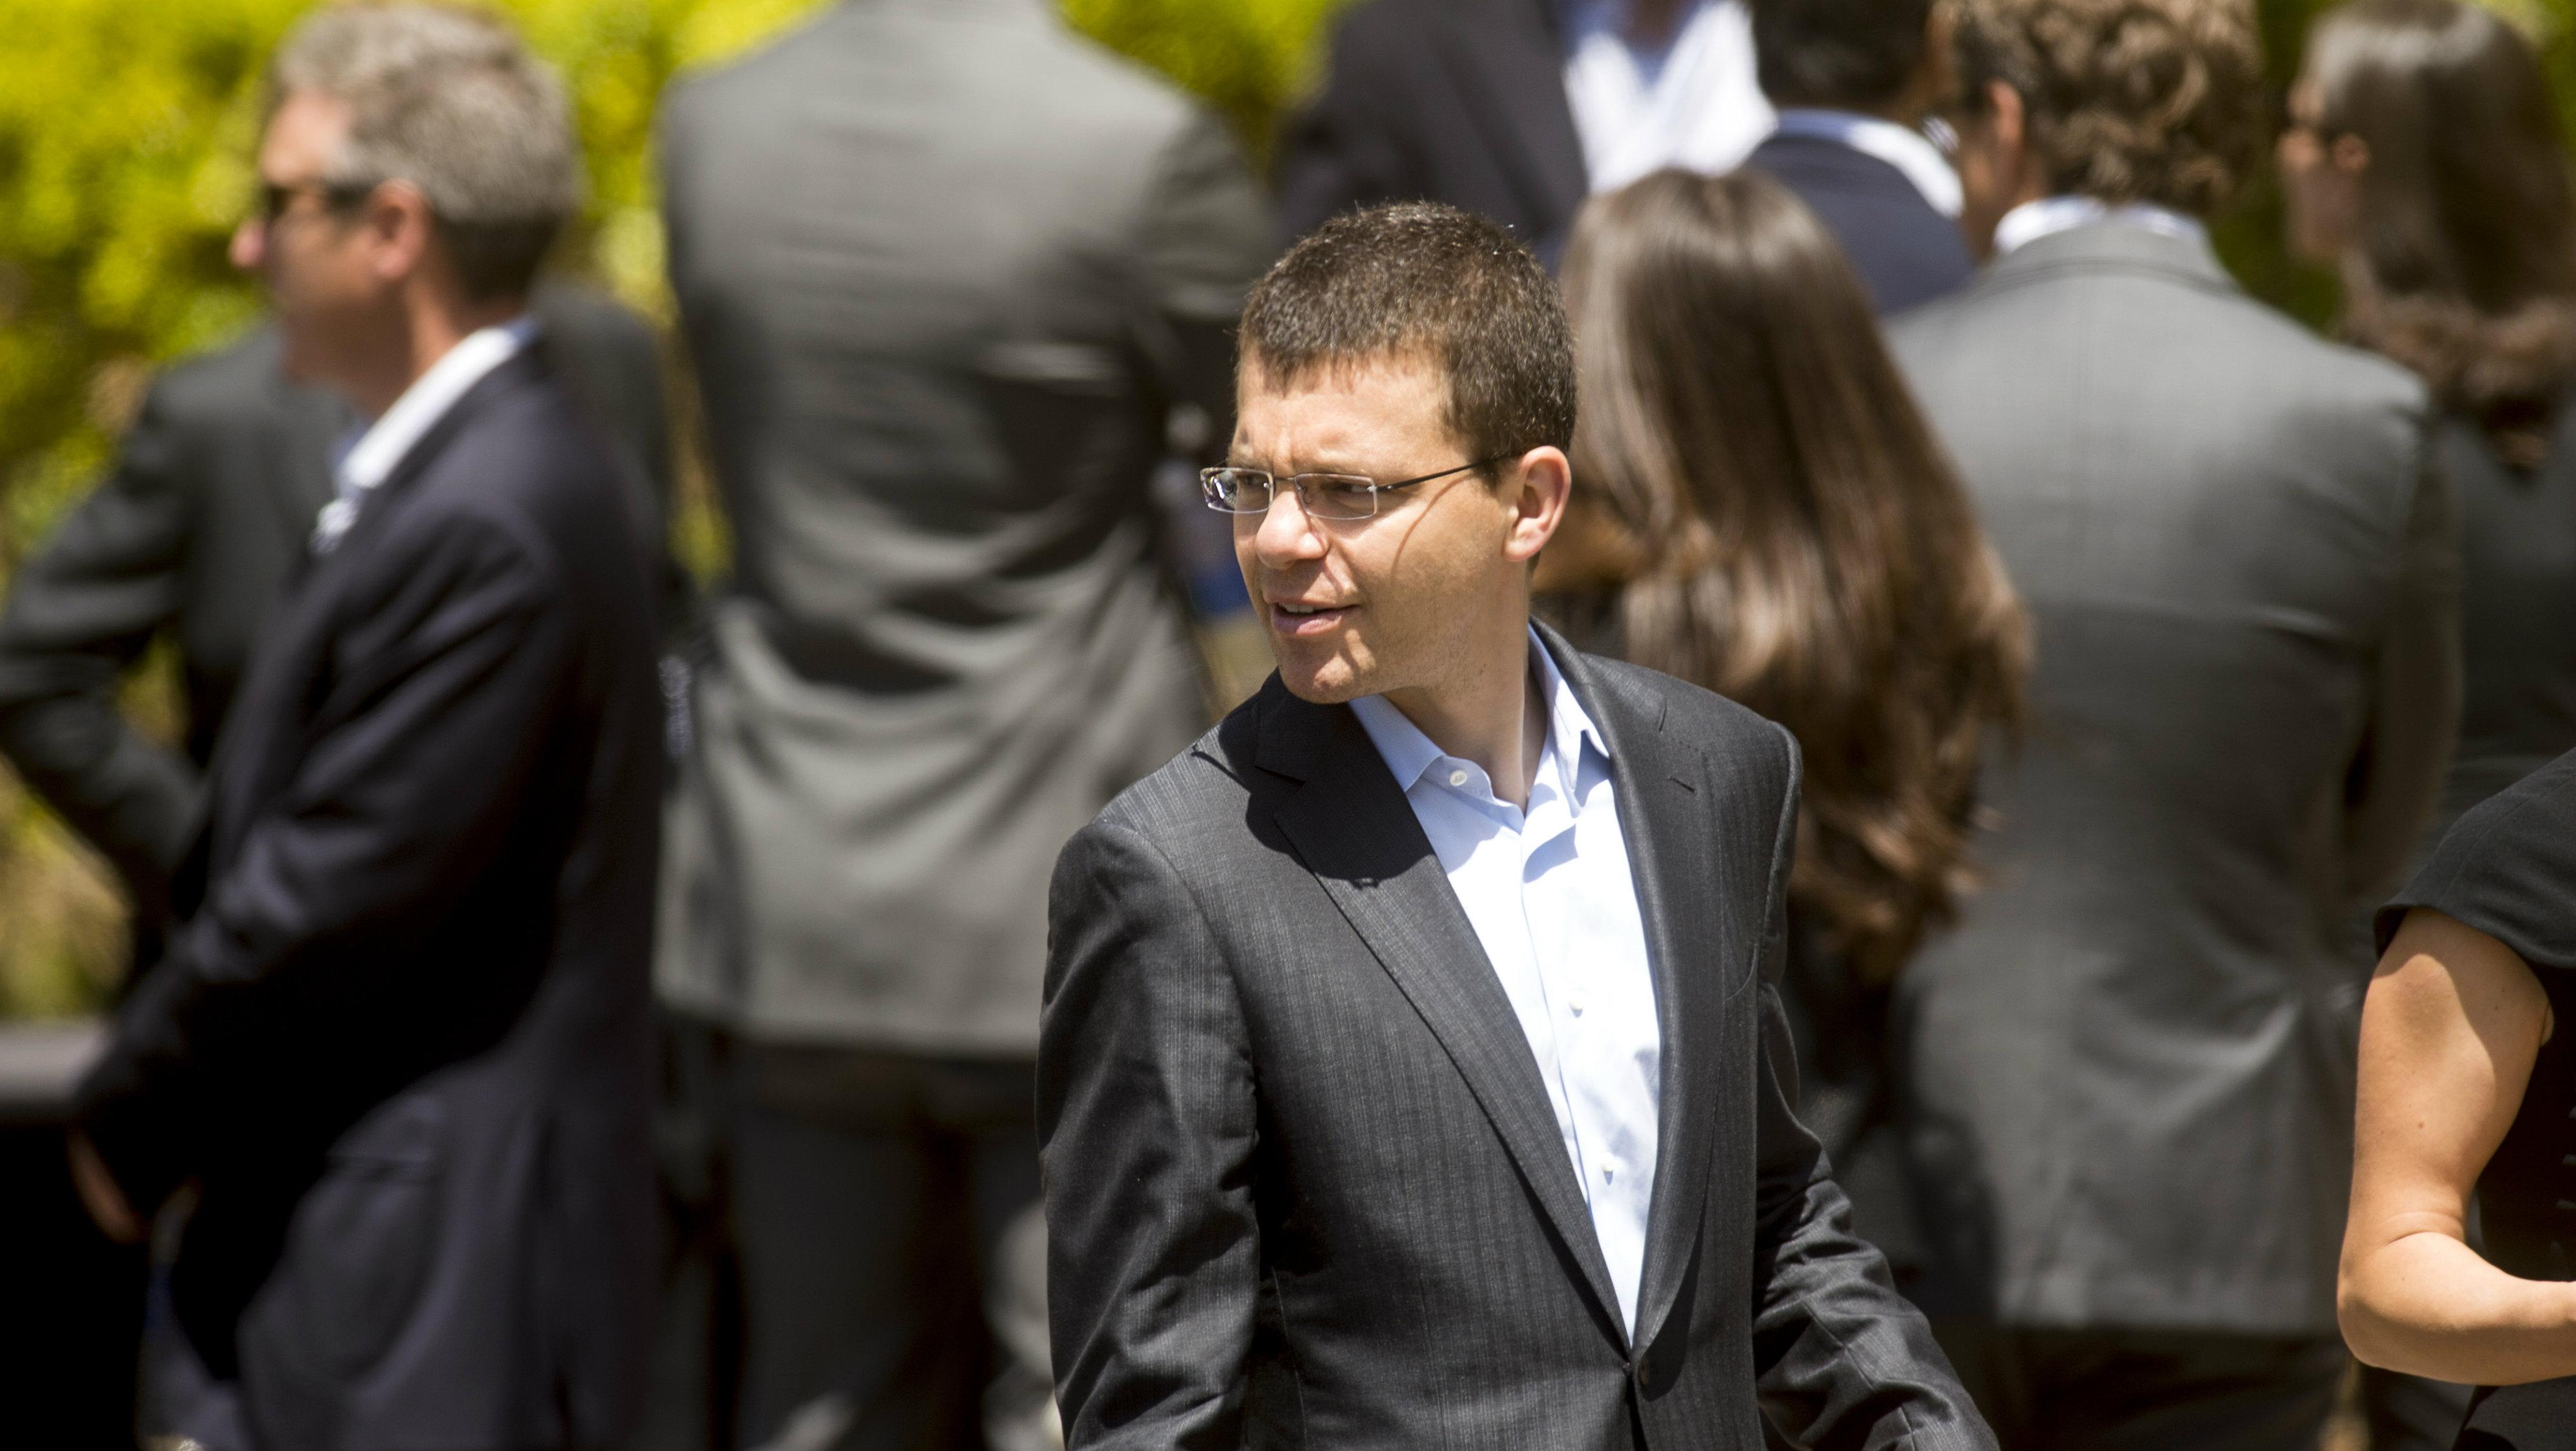 Max Levchin at Survey Monkey CEO Dave Goldberg's funeral.